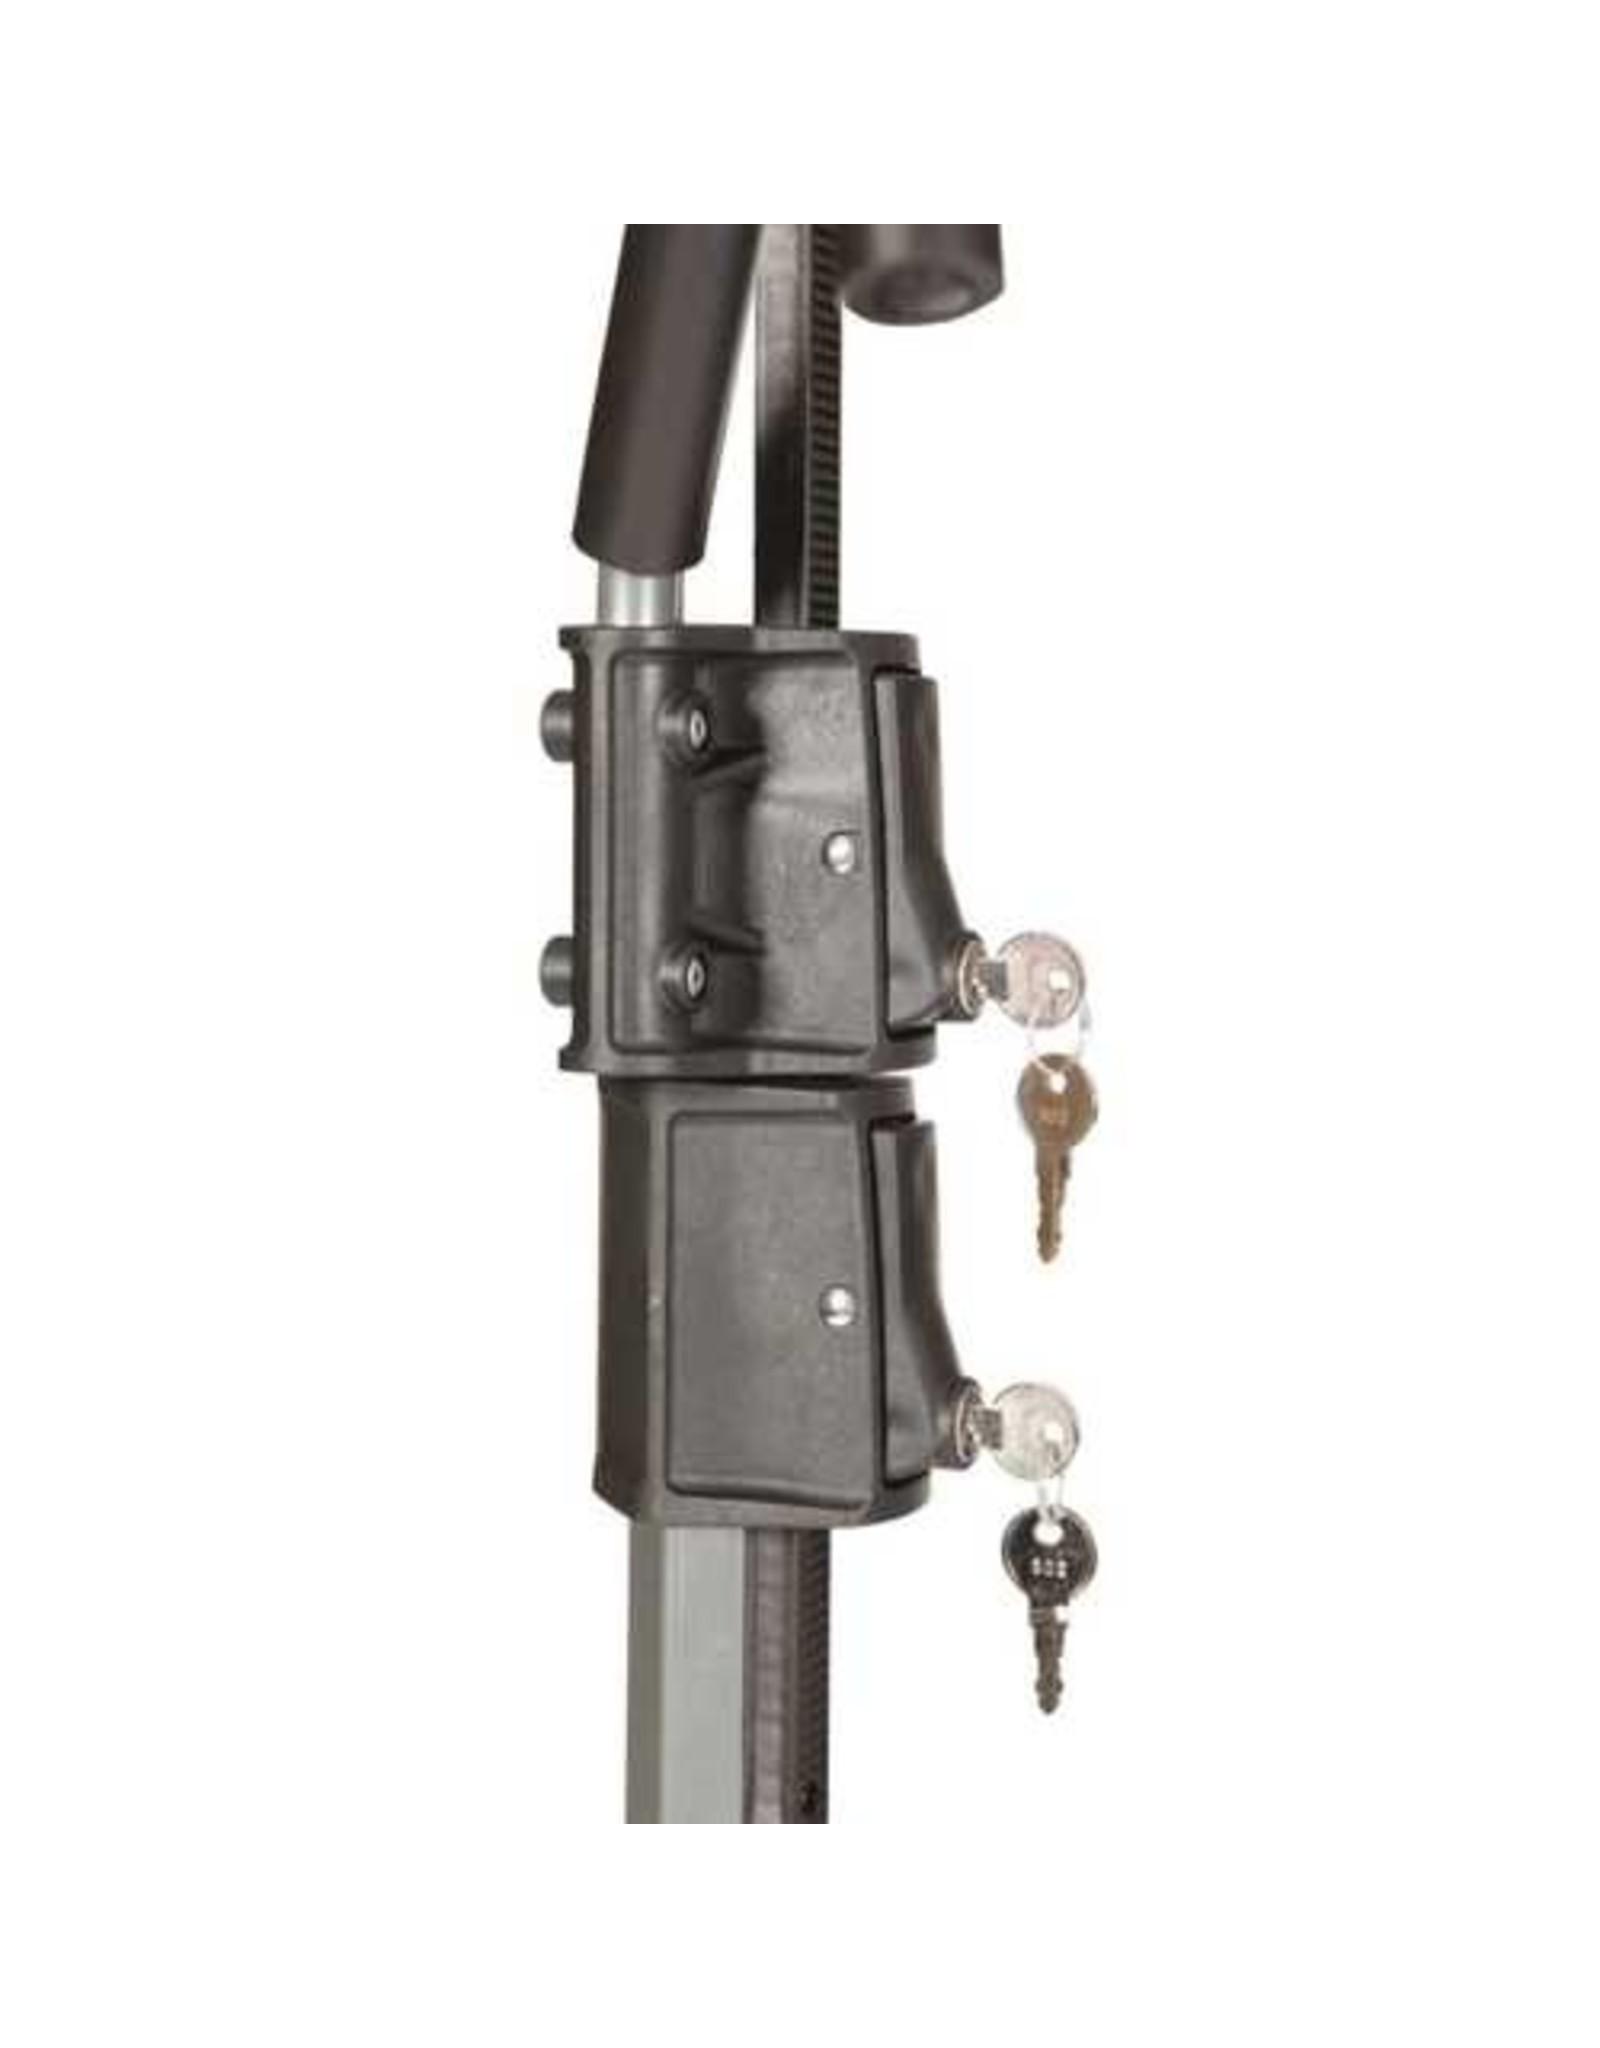 Swagman Swagman G10 bike rack with lock